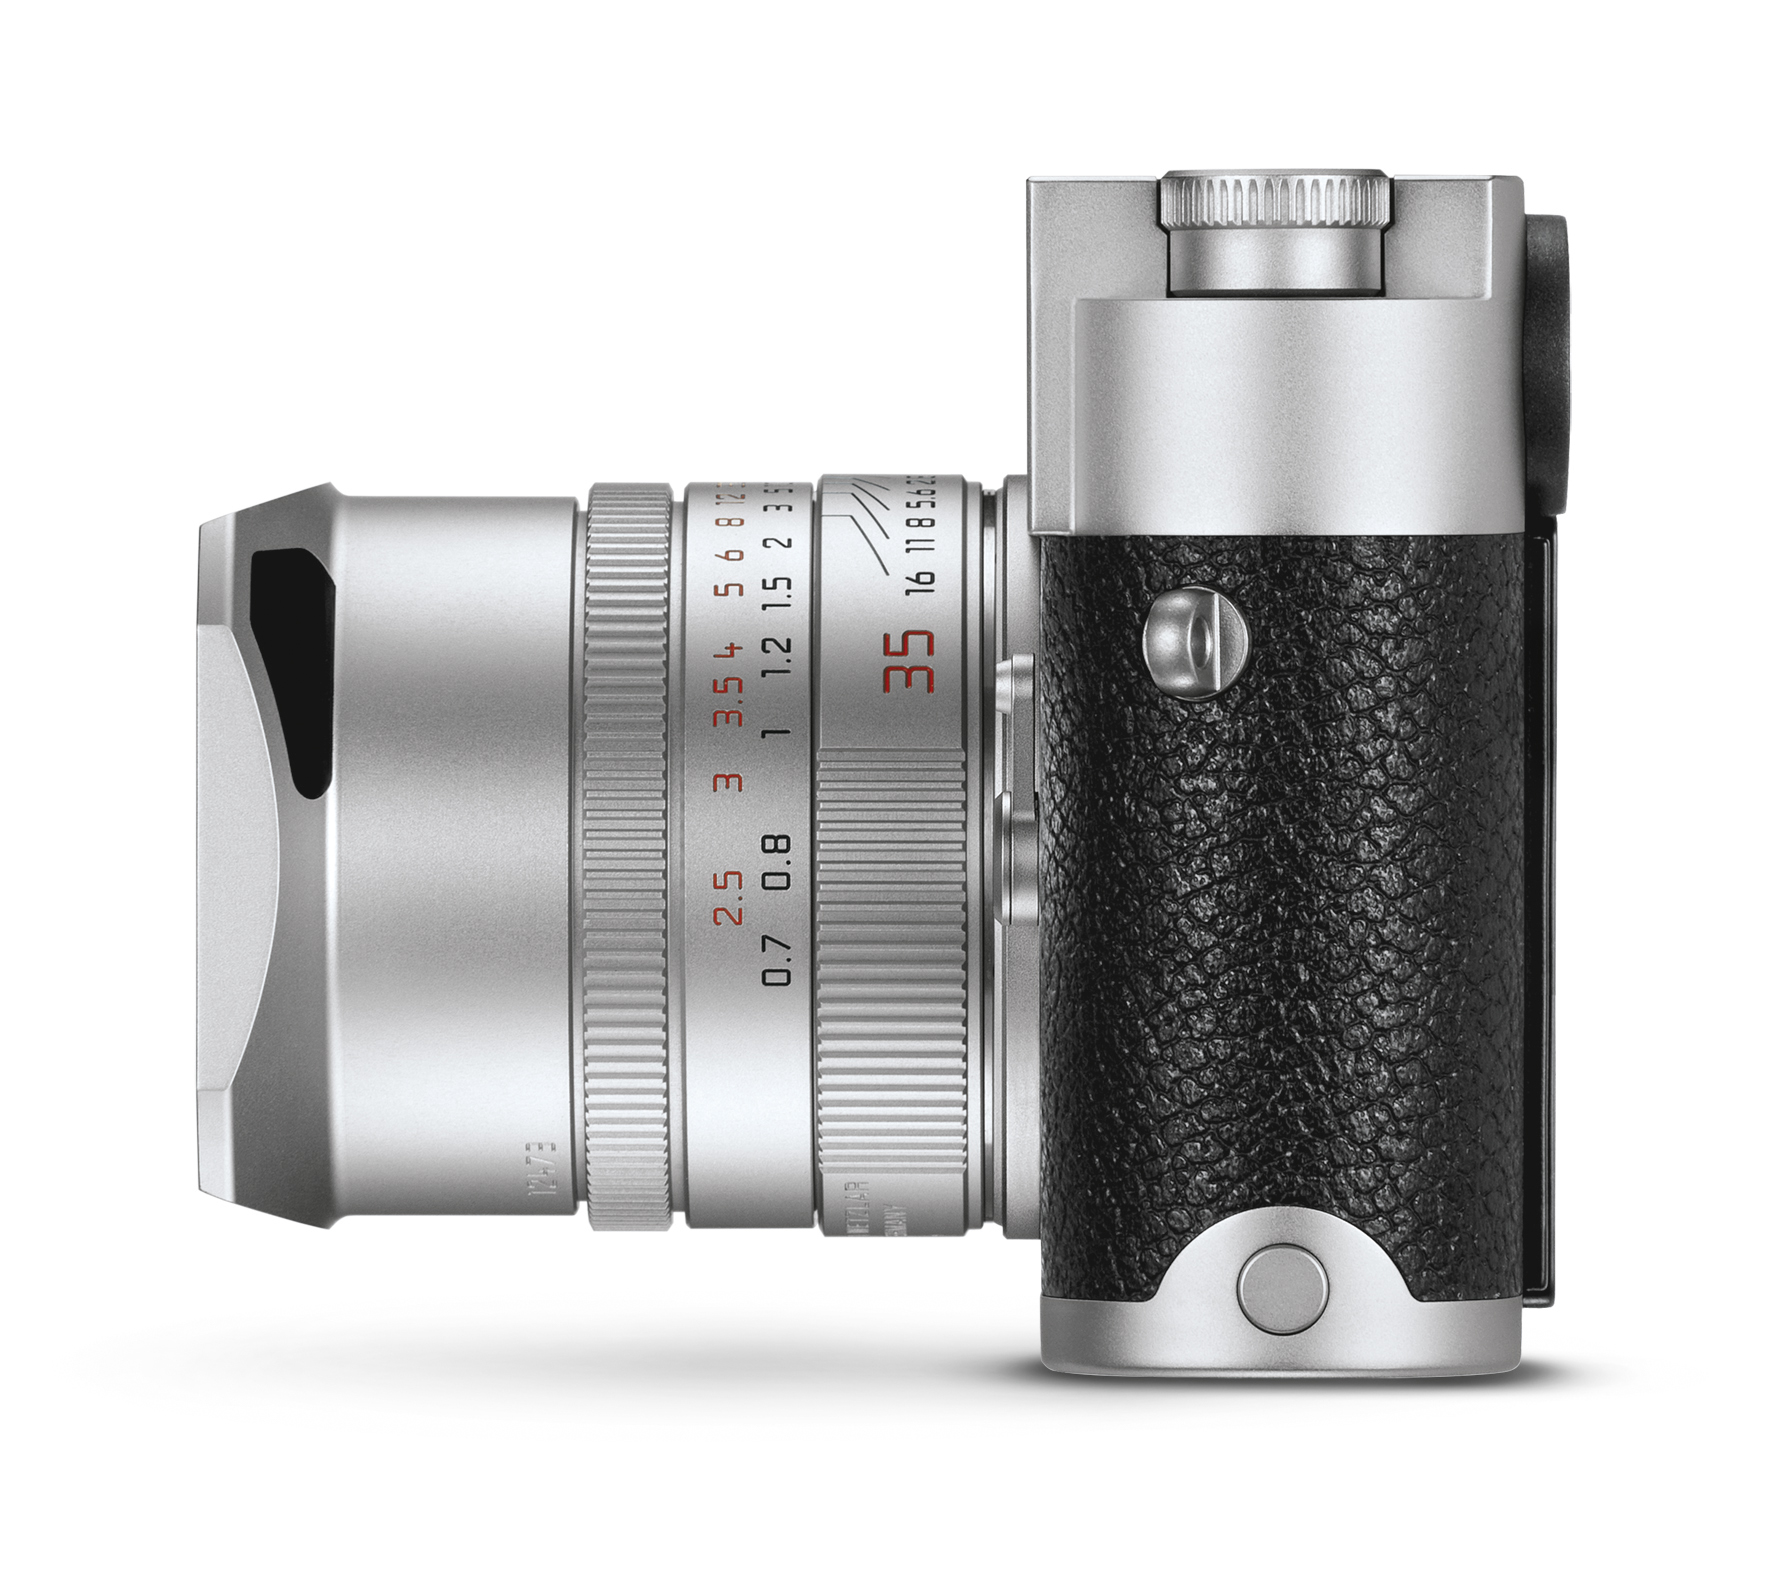 M10-P_silver+Summicron_2_35_left.jpg